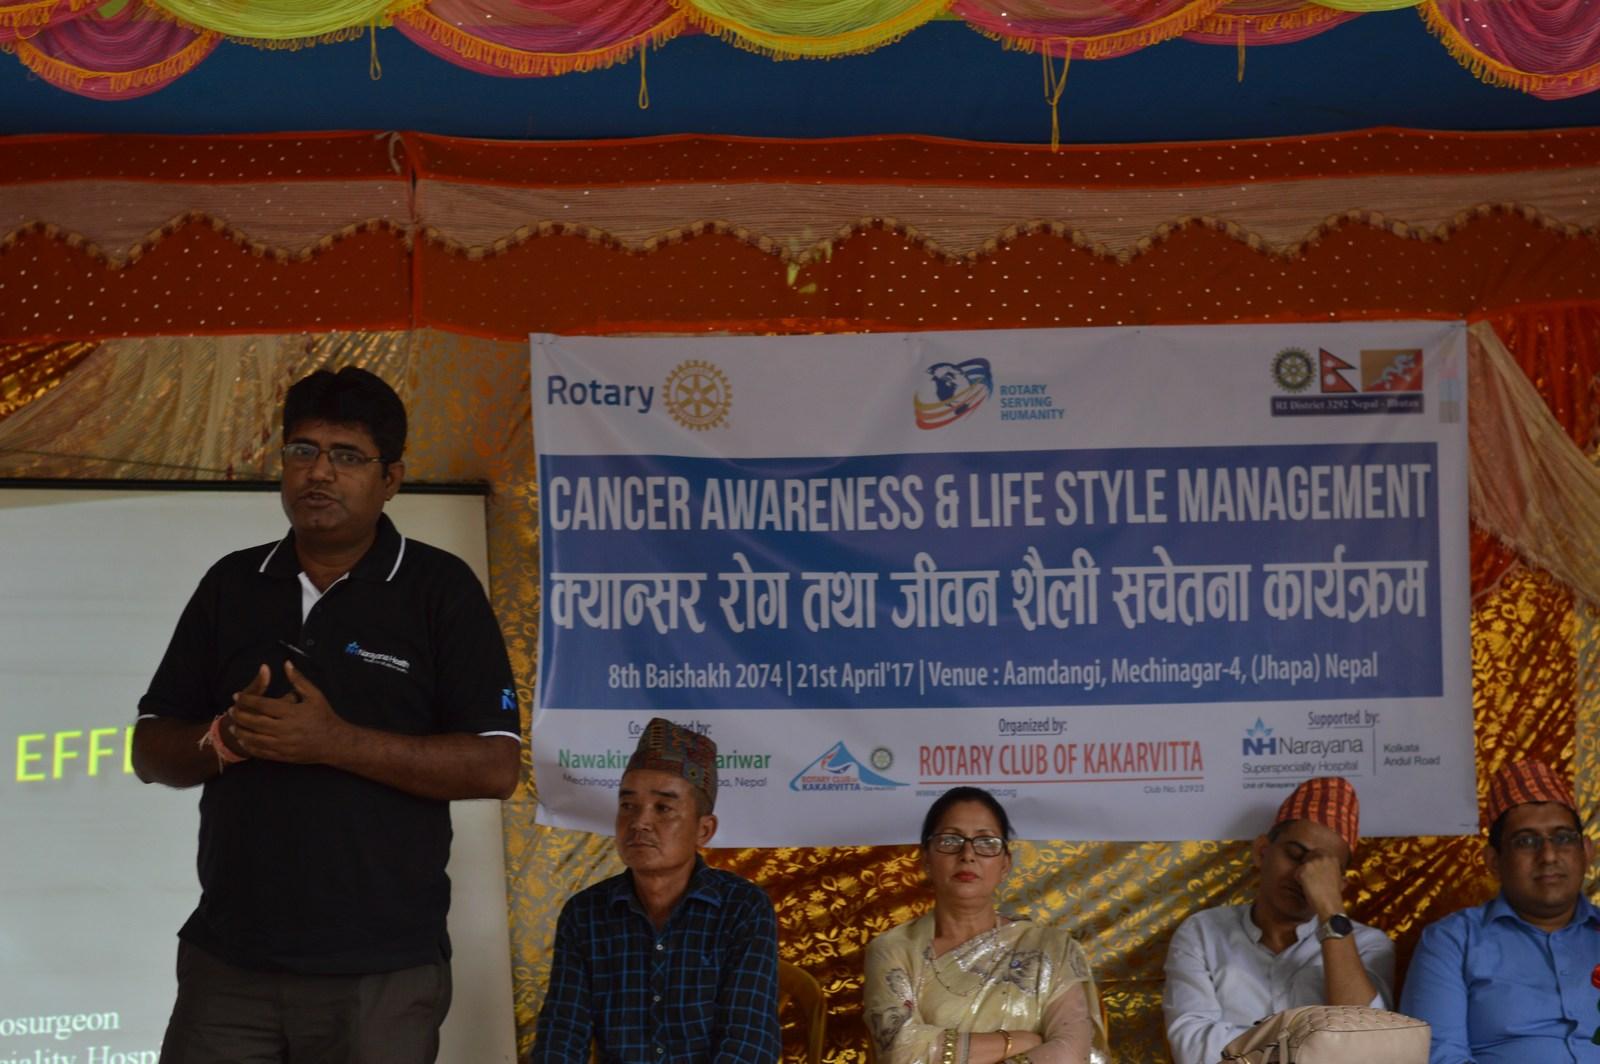 Cancer-Awareness-Life-Style-Management-Interaction-Program-2016-17-Rotary-Club-of-Kakarvitta-32